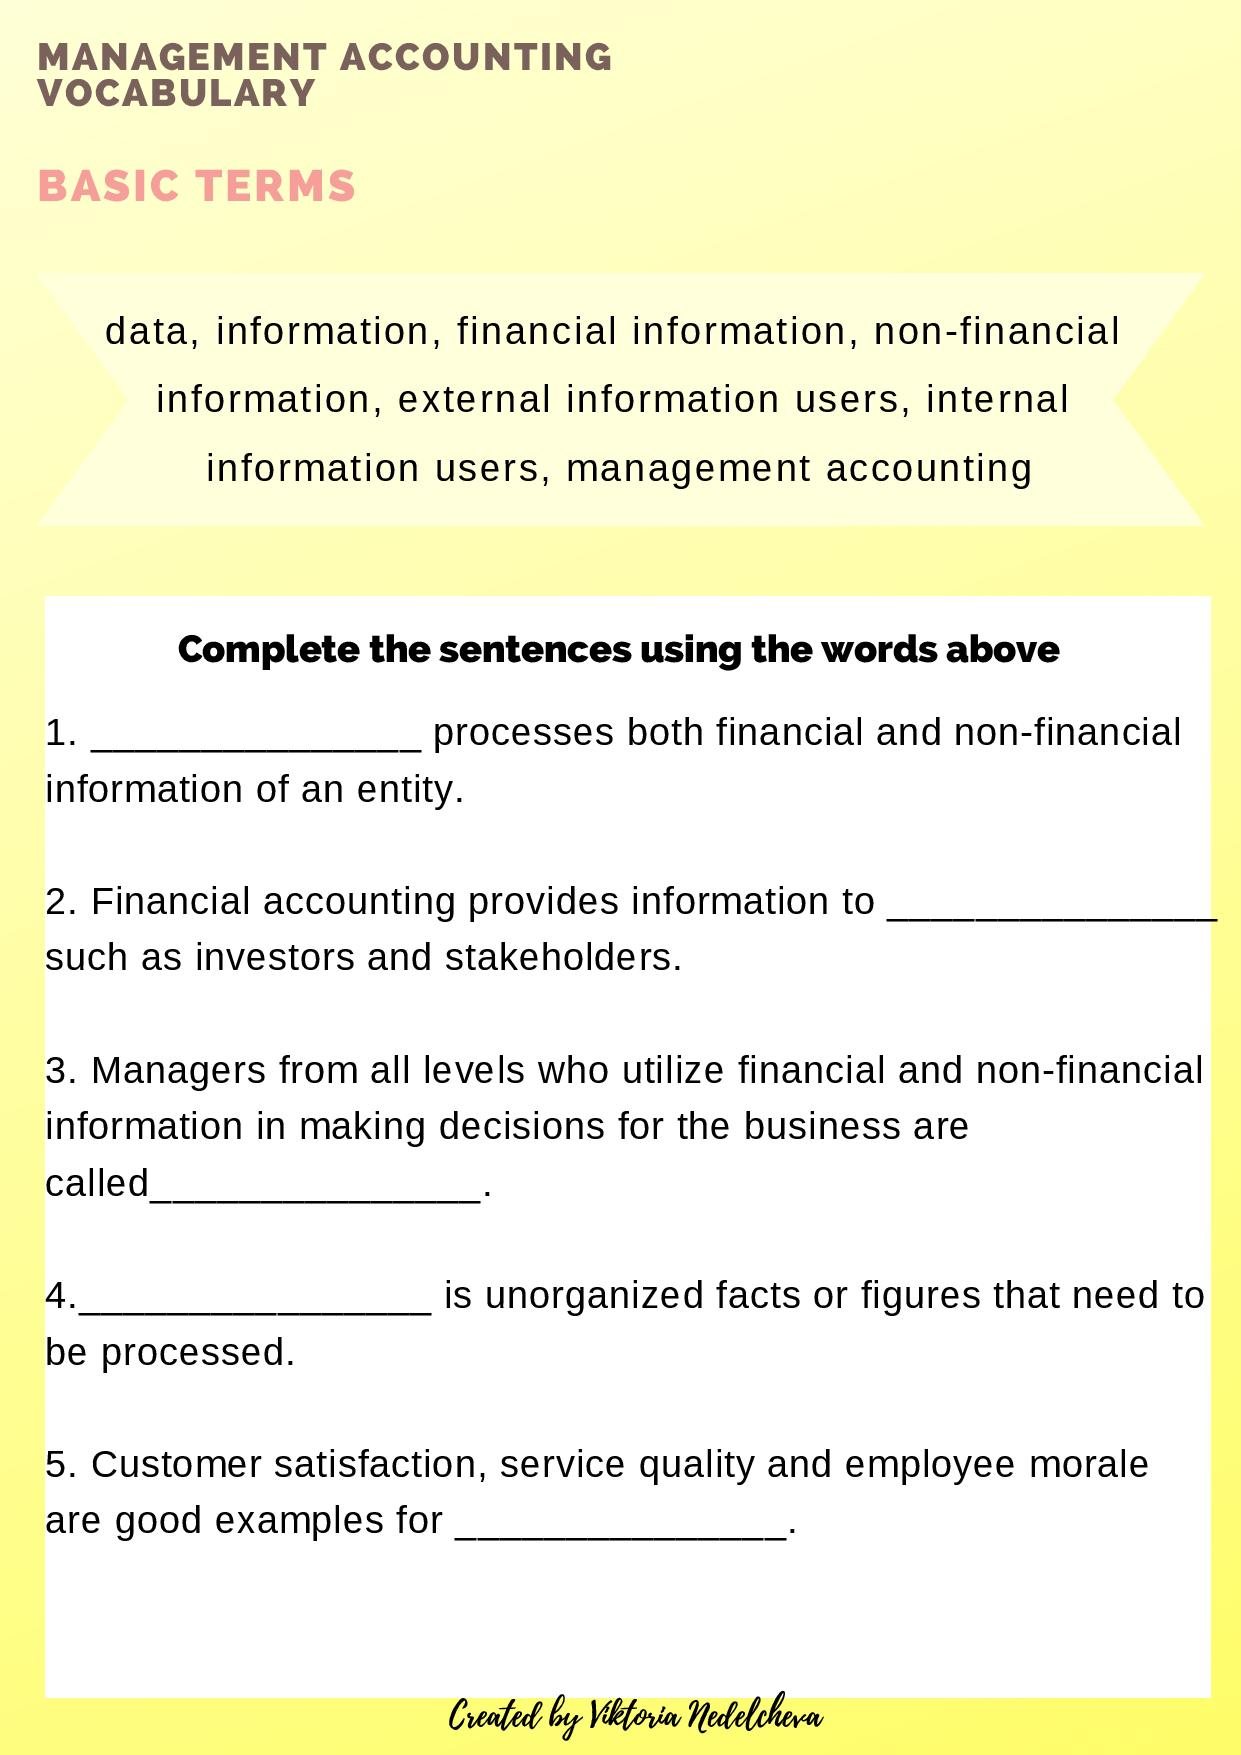 Management Accounting Vocabulary